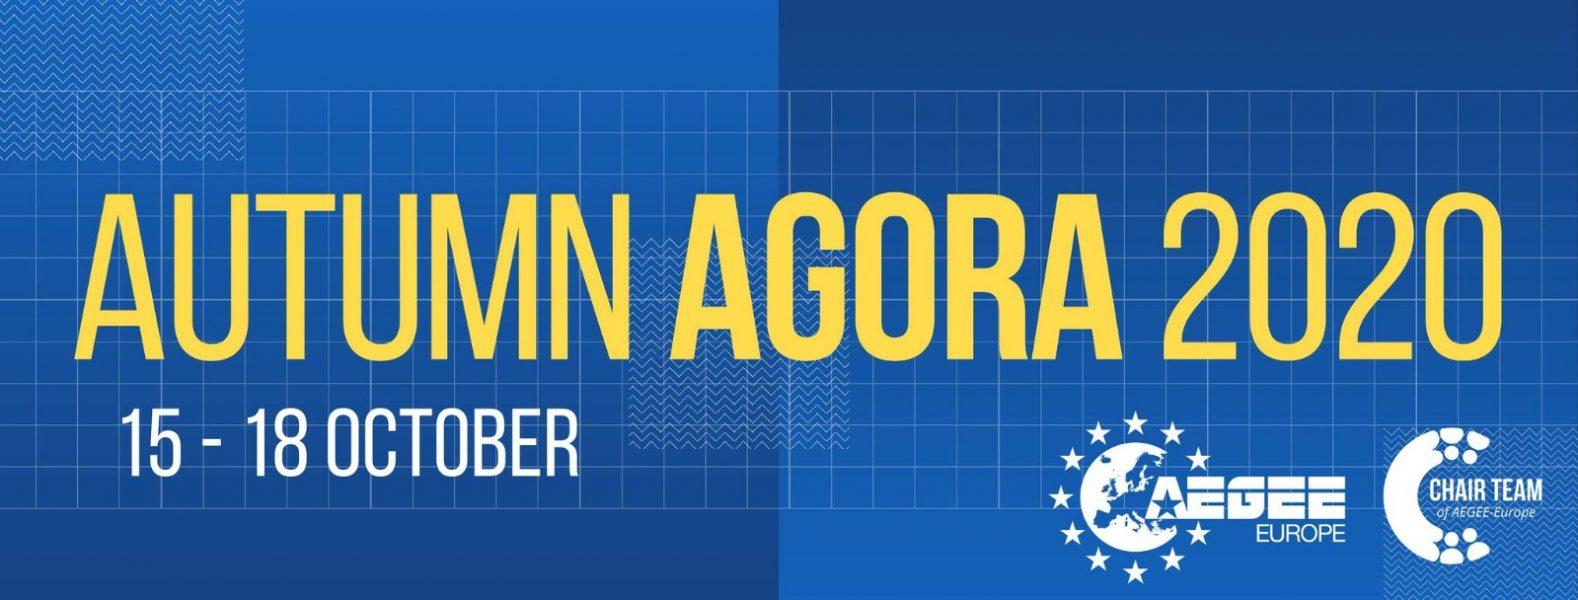 Autumn Agora 2020